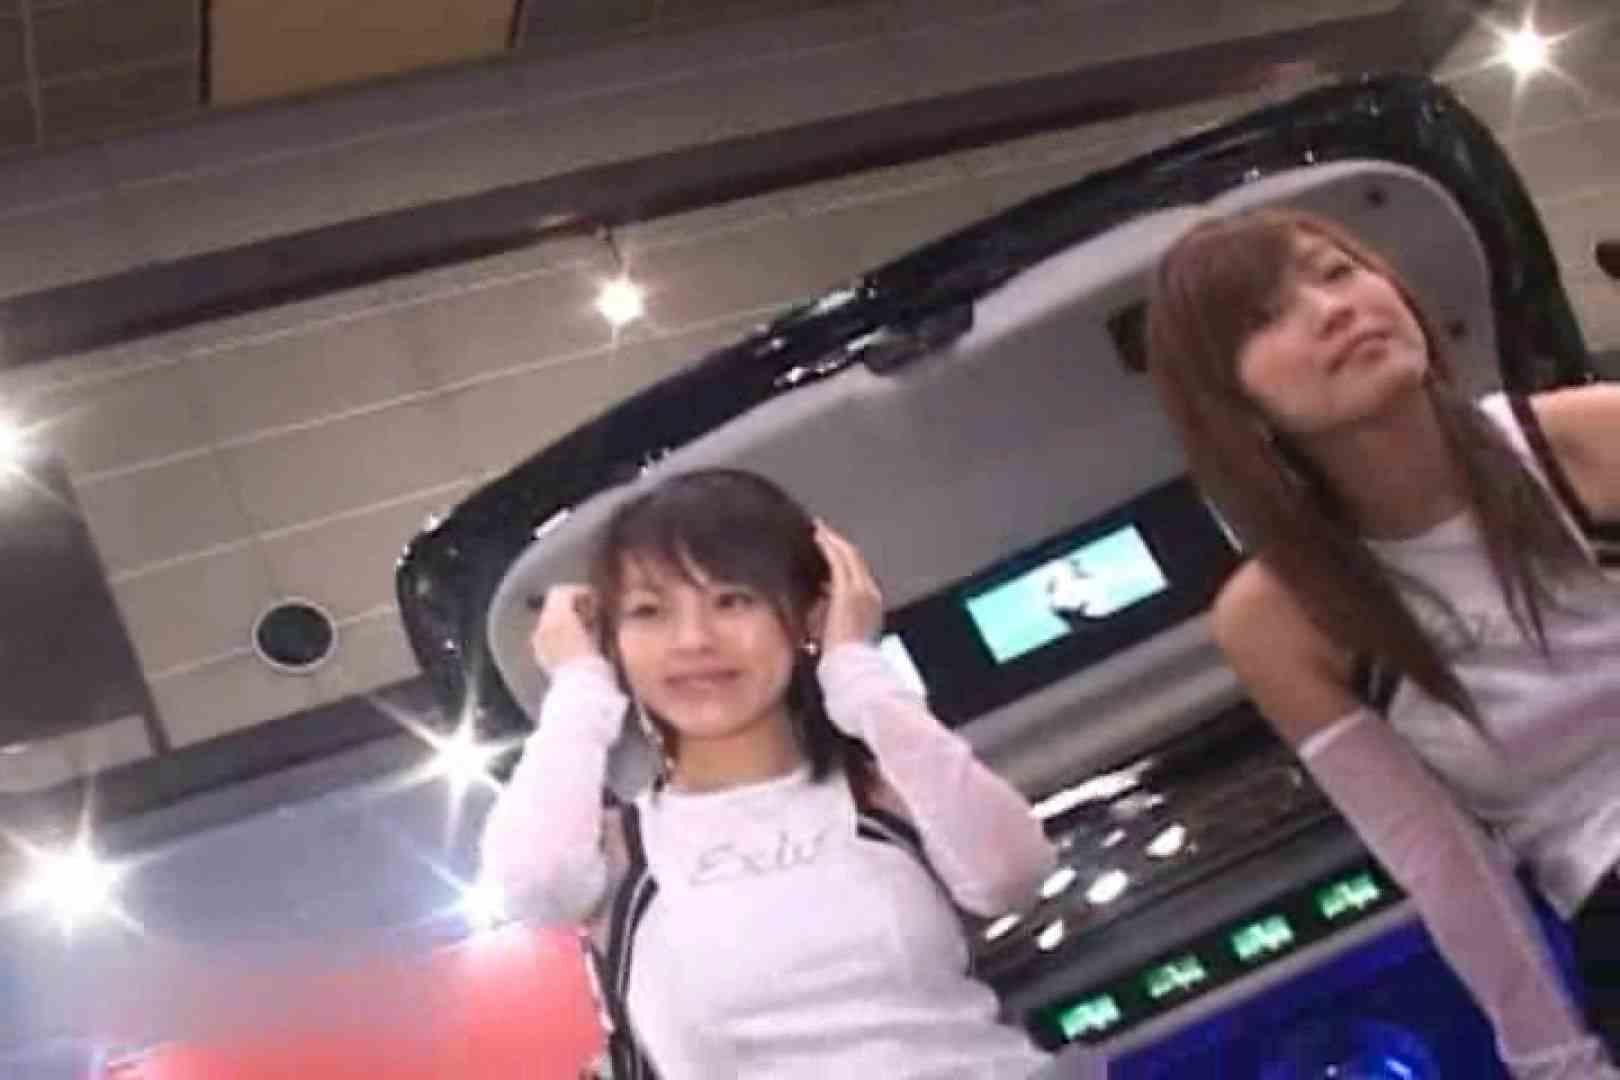 RQカメラ地獄Vol.34 美女OL 戯れ無修正画像 101連発 54